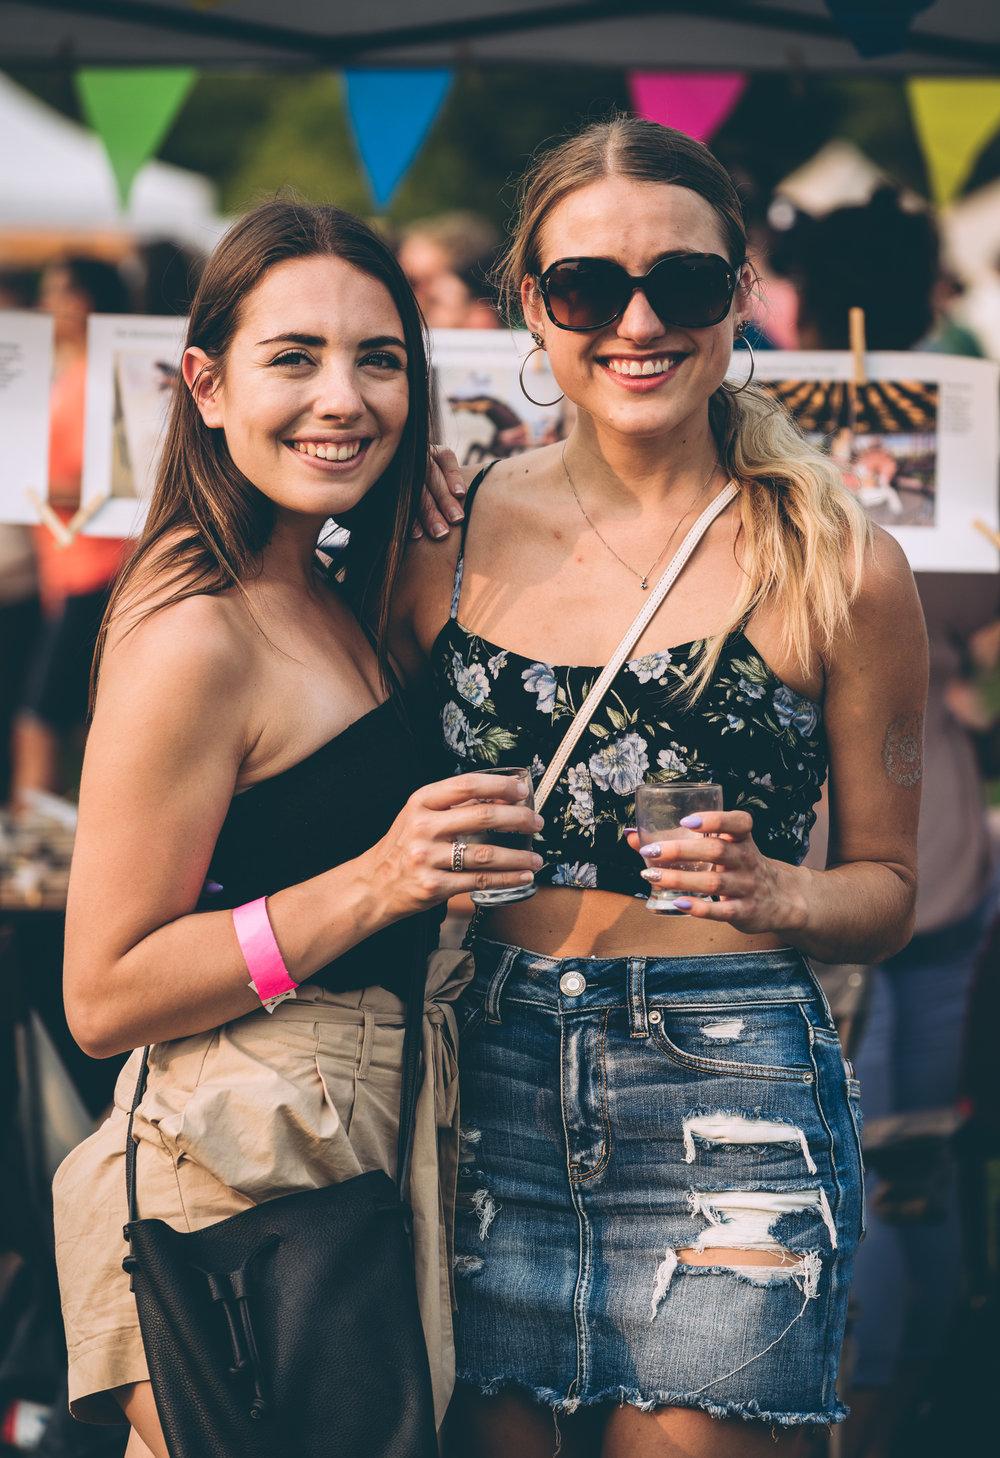 brewha_festival_blog-39.jpg